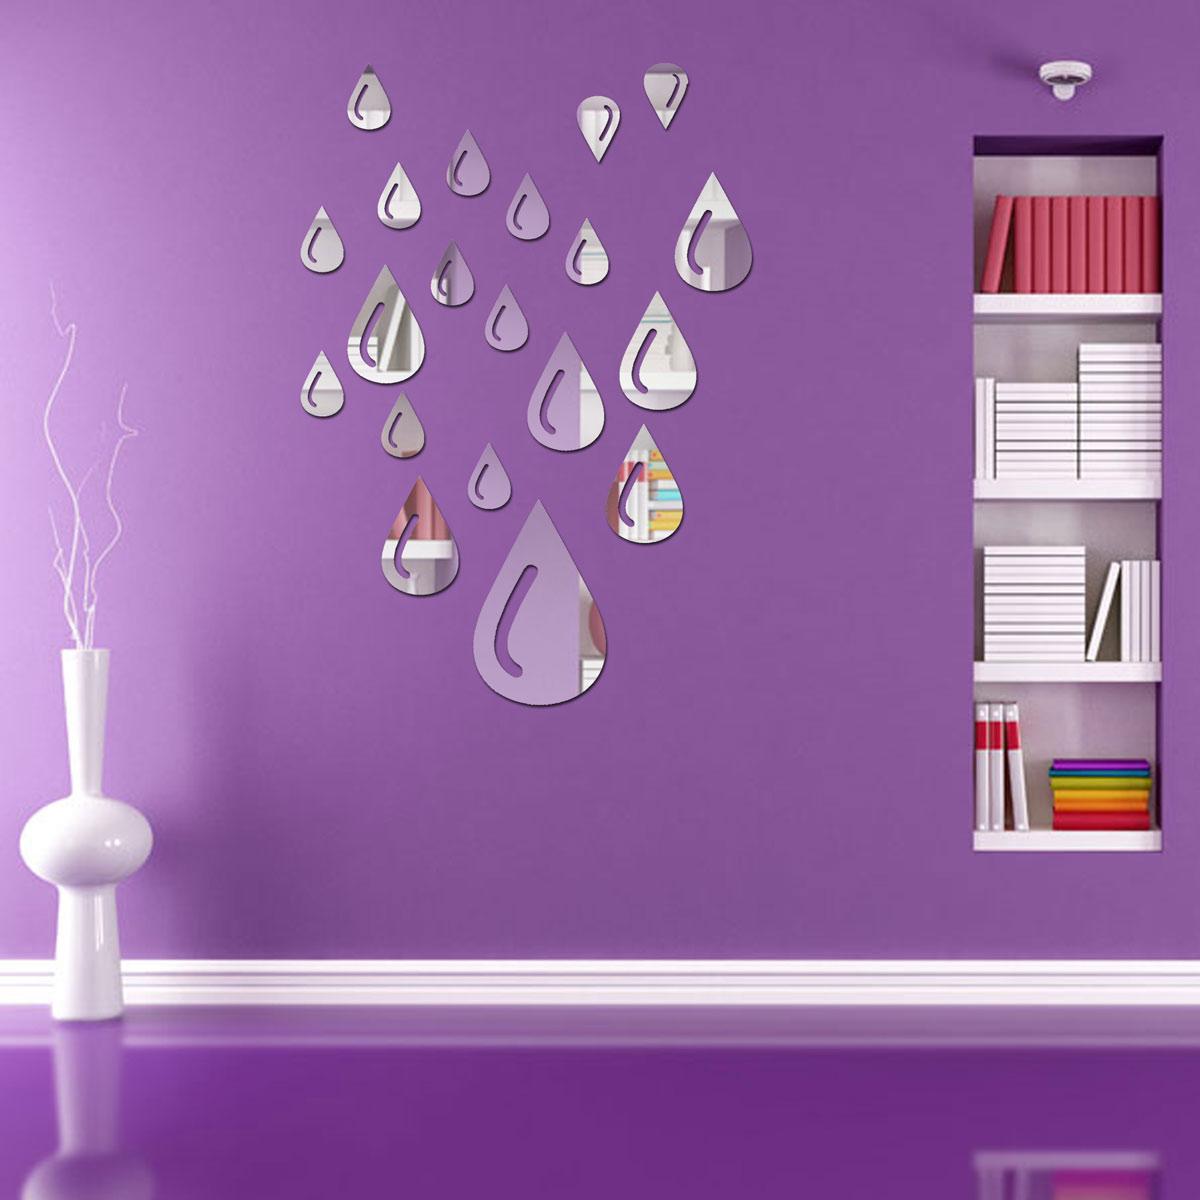 Modern 3D Acrylic Mirror Wall Home Decal Mural Decoration Vinyl Art DIY Stickers